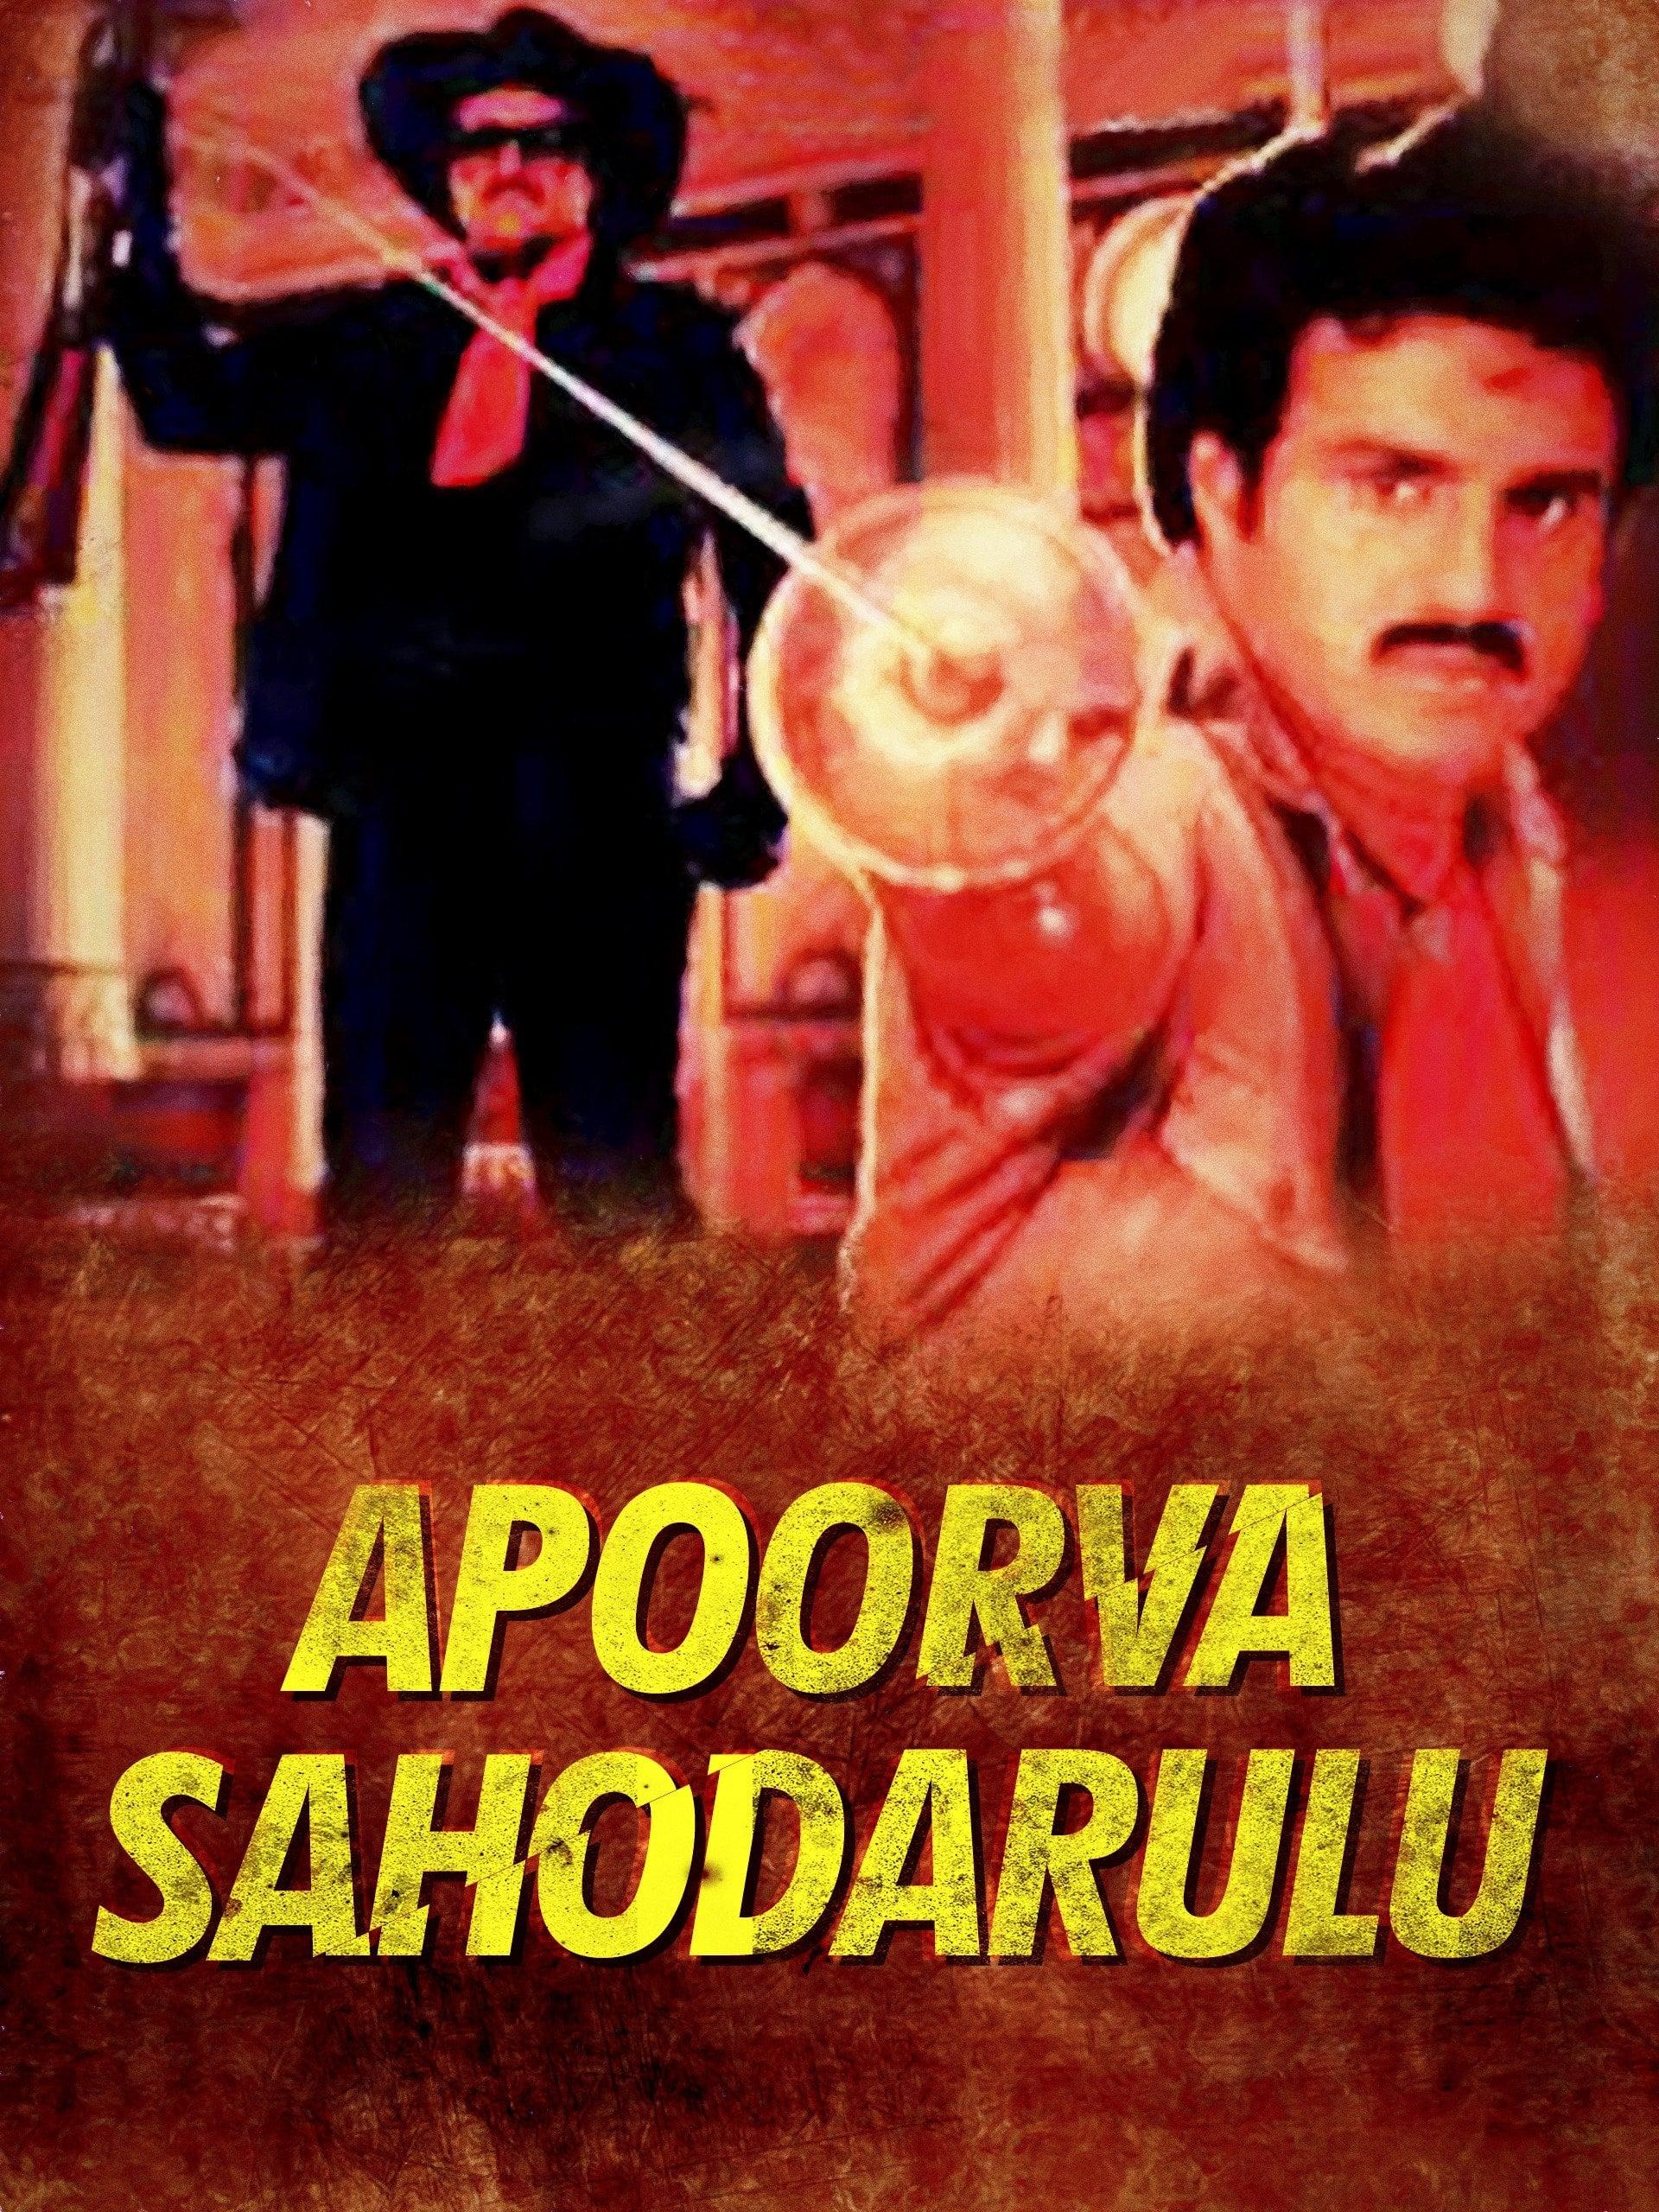 Apoorva Sahodarulu (1986)